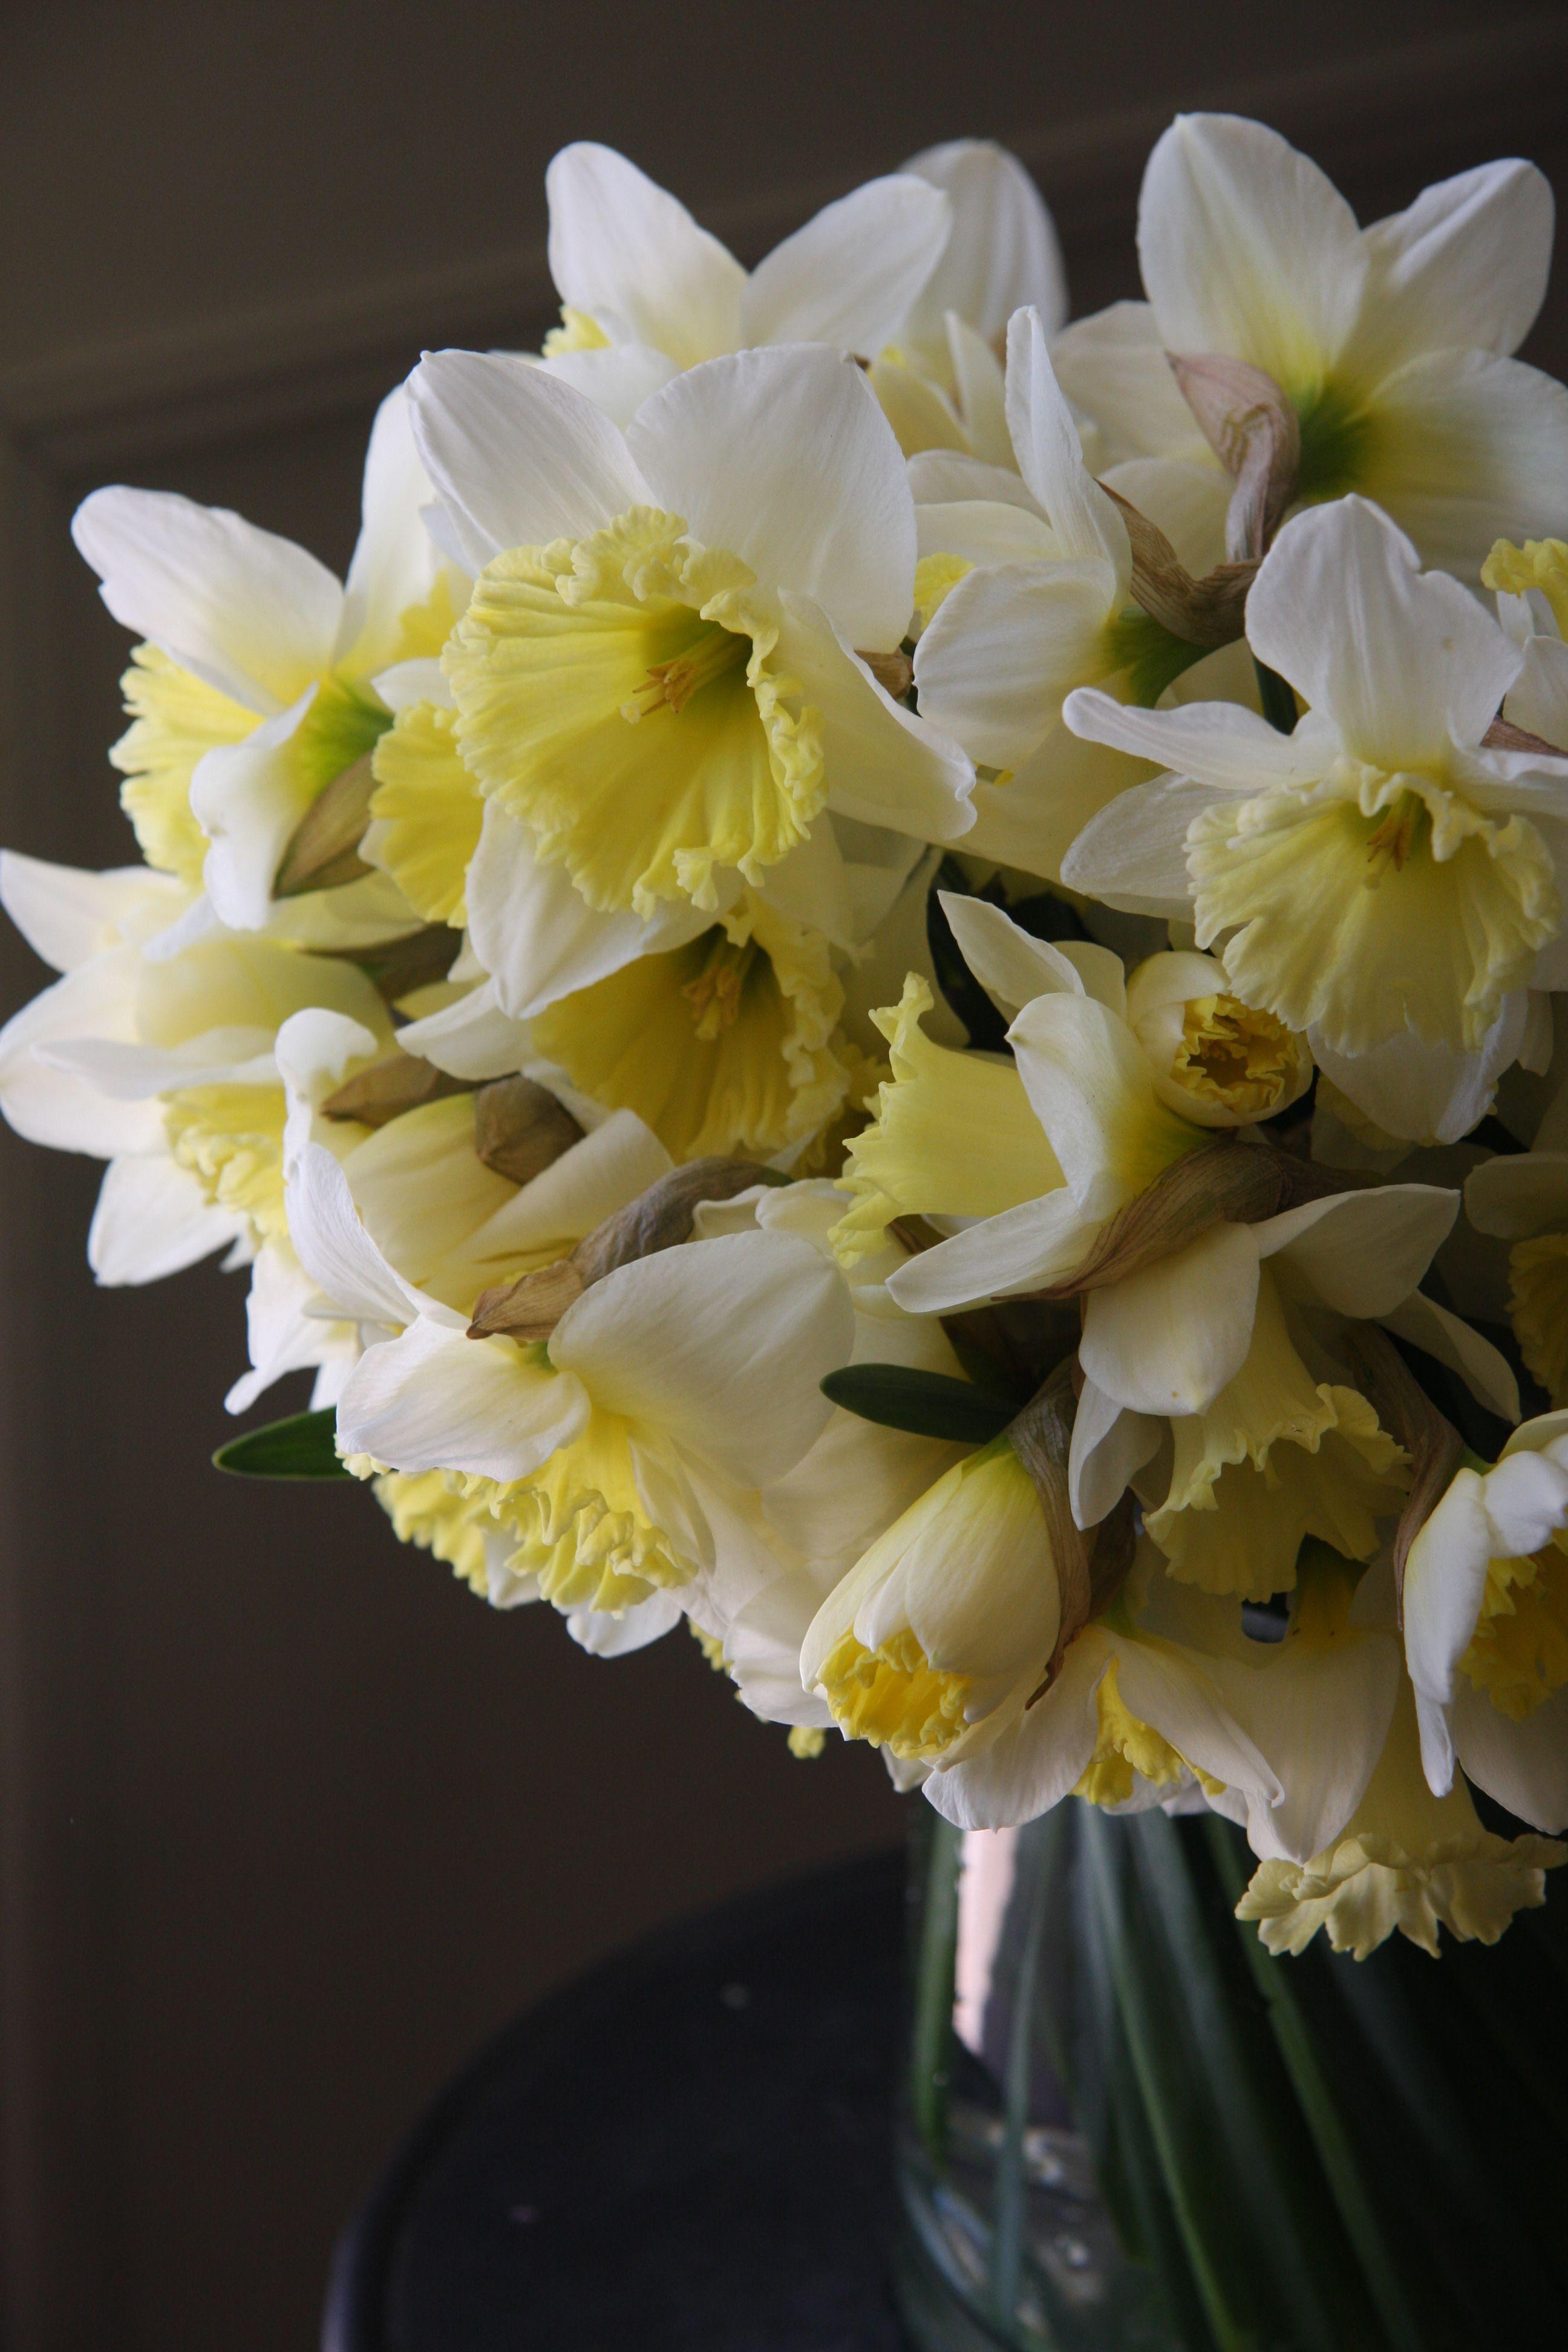 Narcisi Daffodil Daffodils Pinterest Daffodils Flowers And